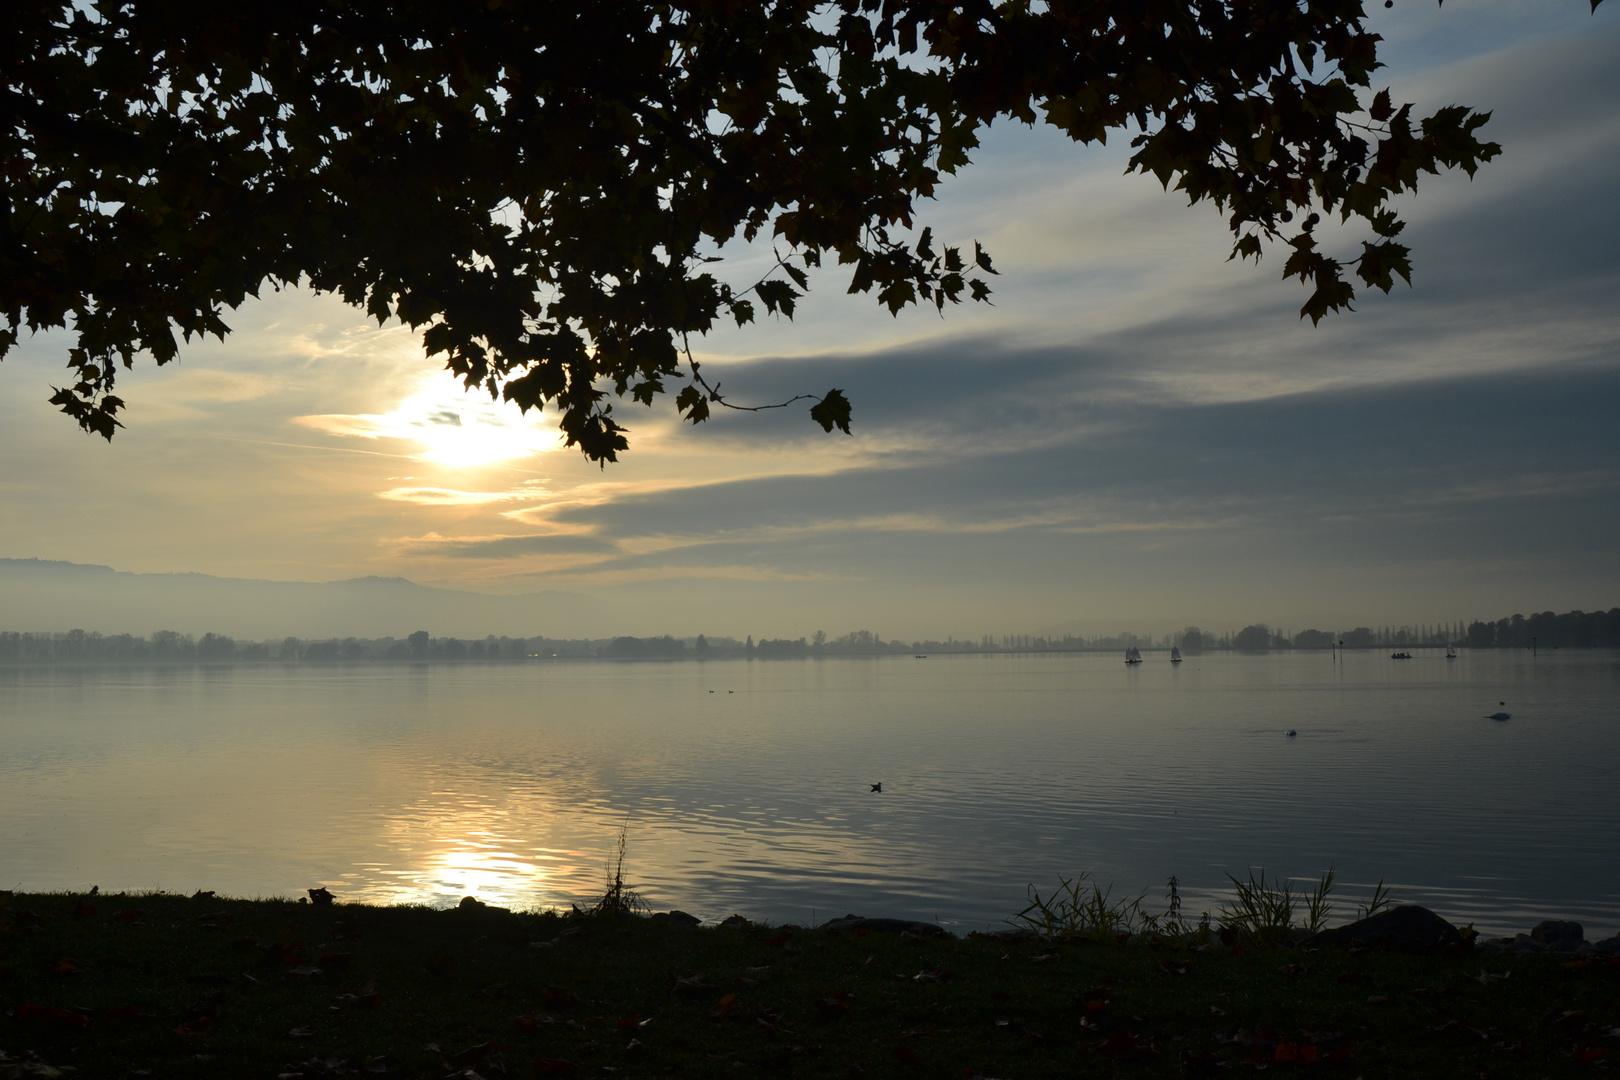 Sonnenuntergang am Bodensee 1